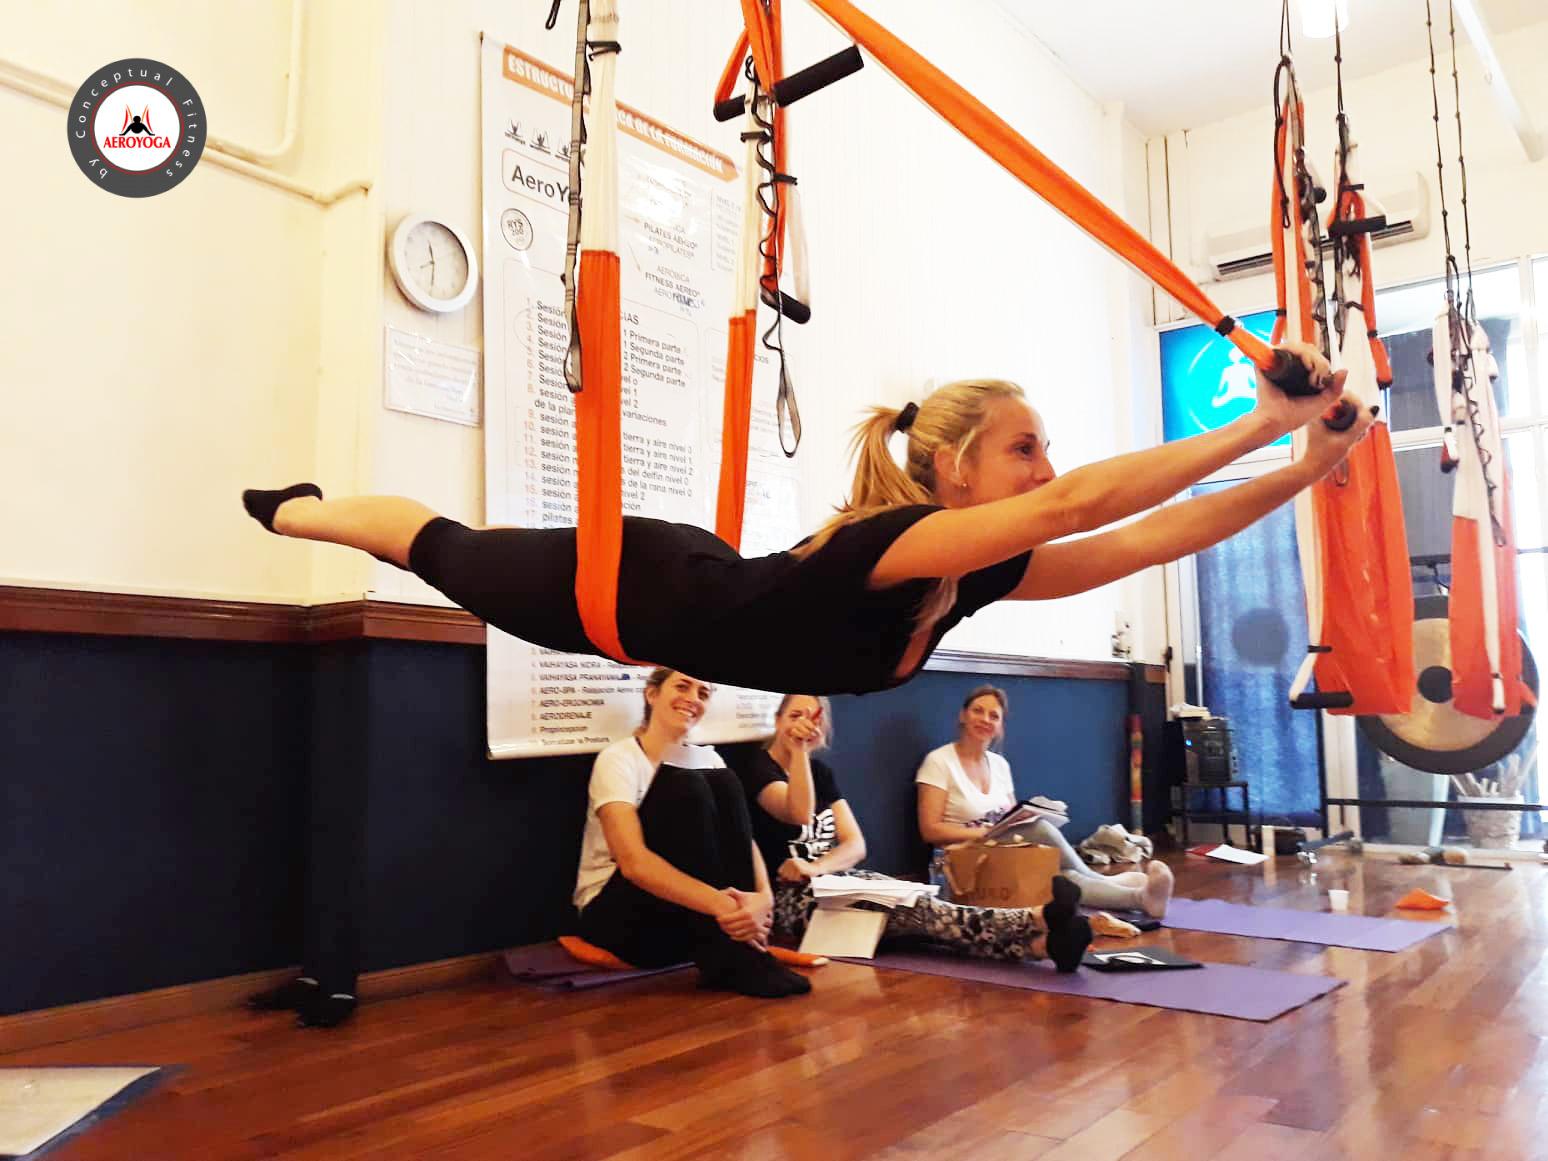 Continúa en Argentina el AeroYoga ® Teacher Training, Profesorado Yoga Aéreo